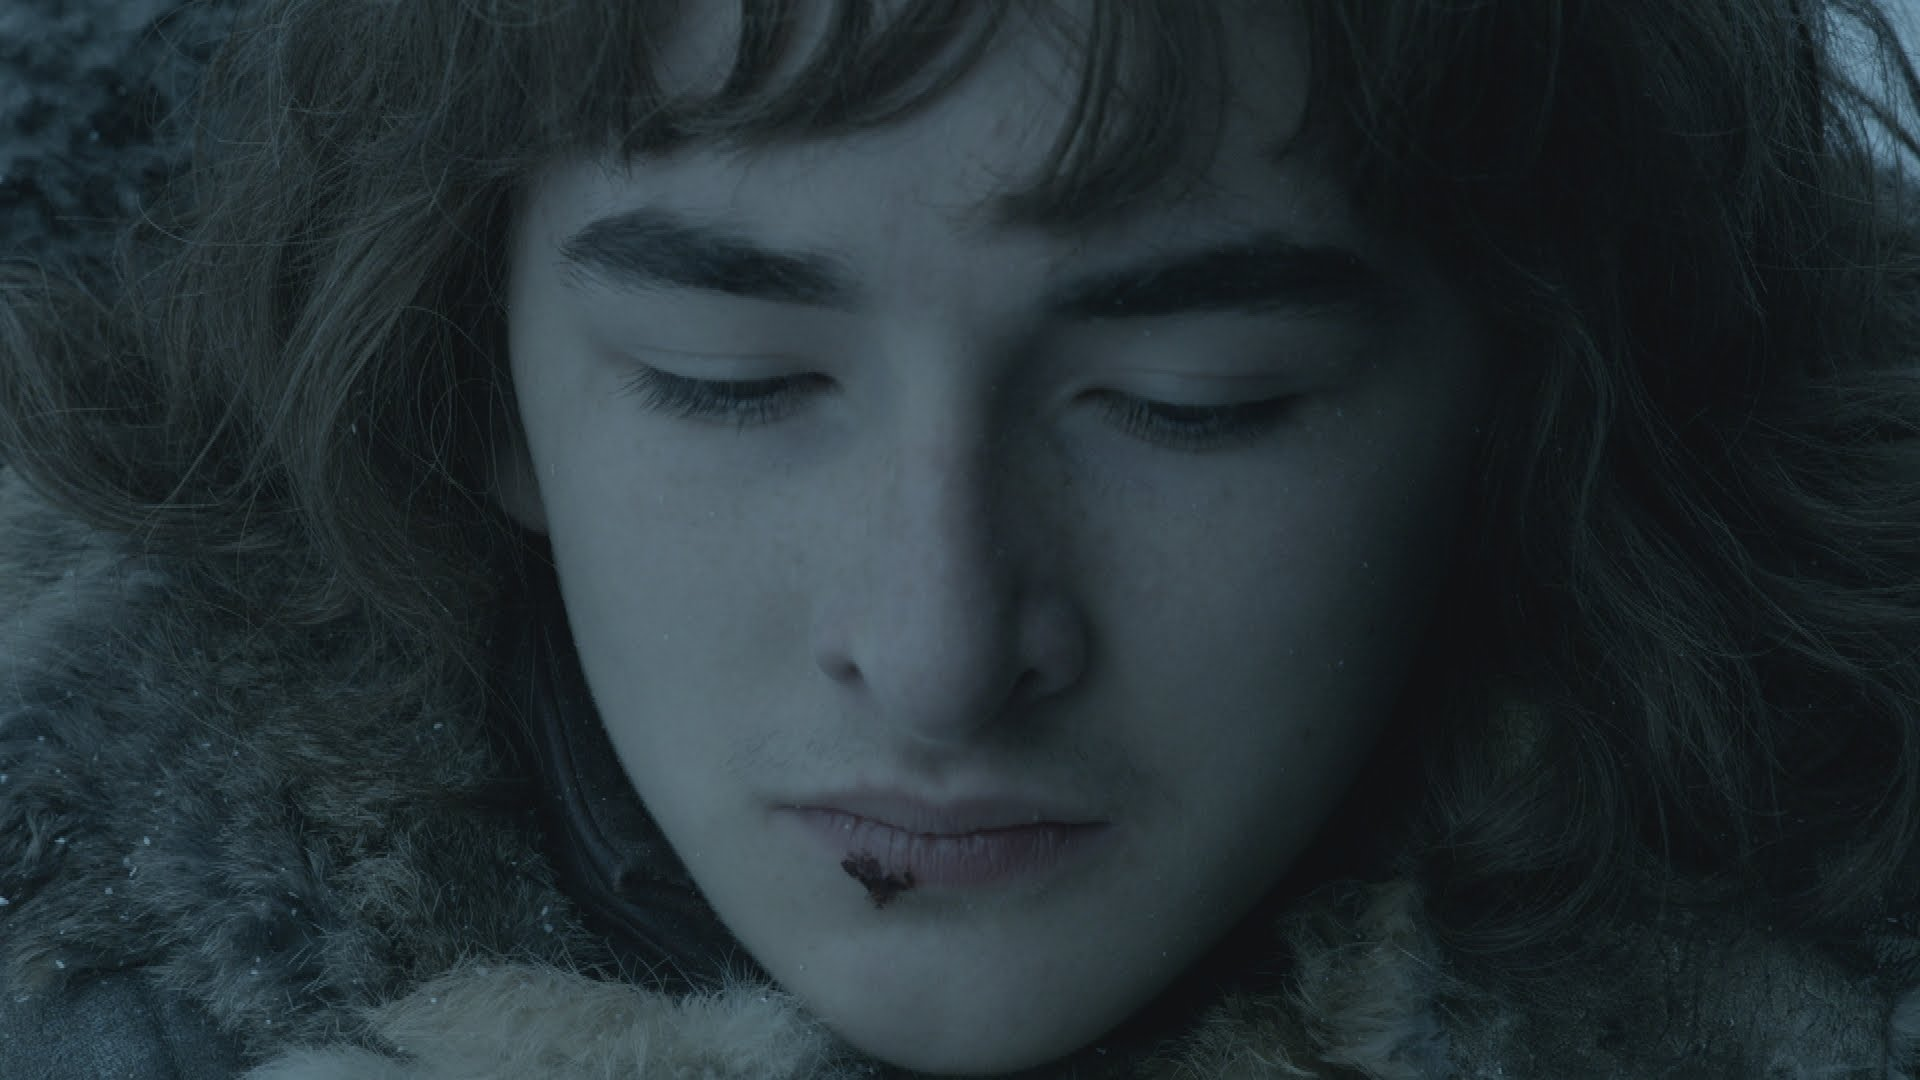 Game of Thrones Season 6 teaser trailer